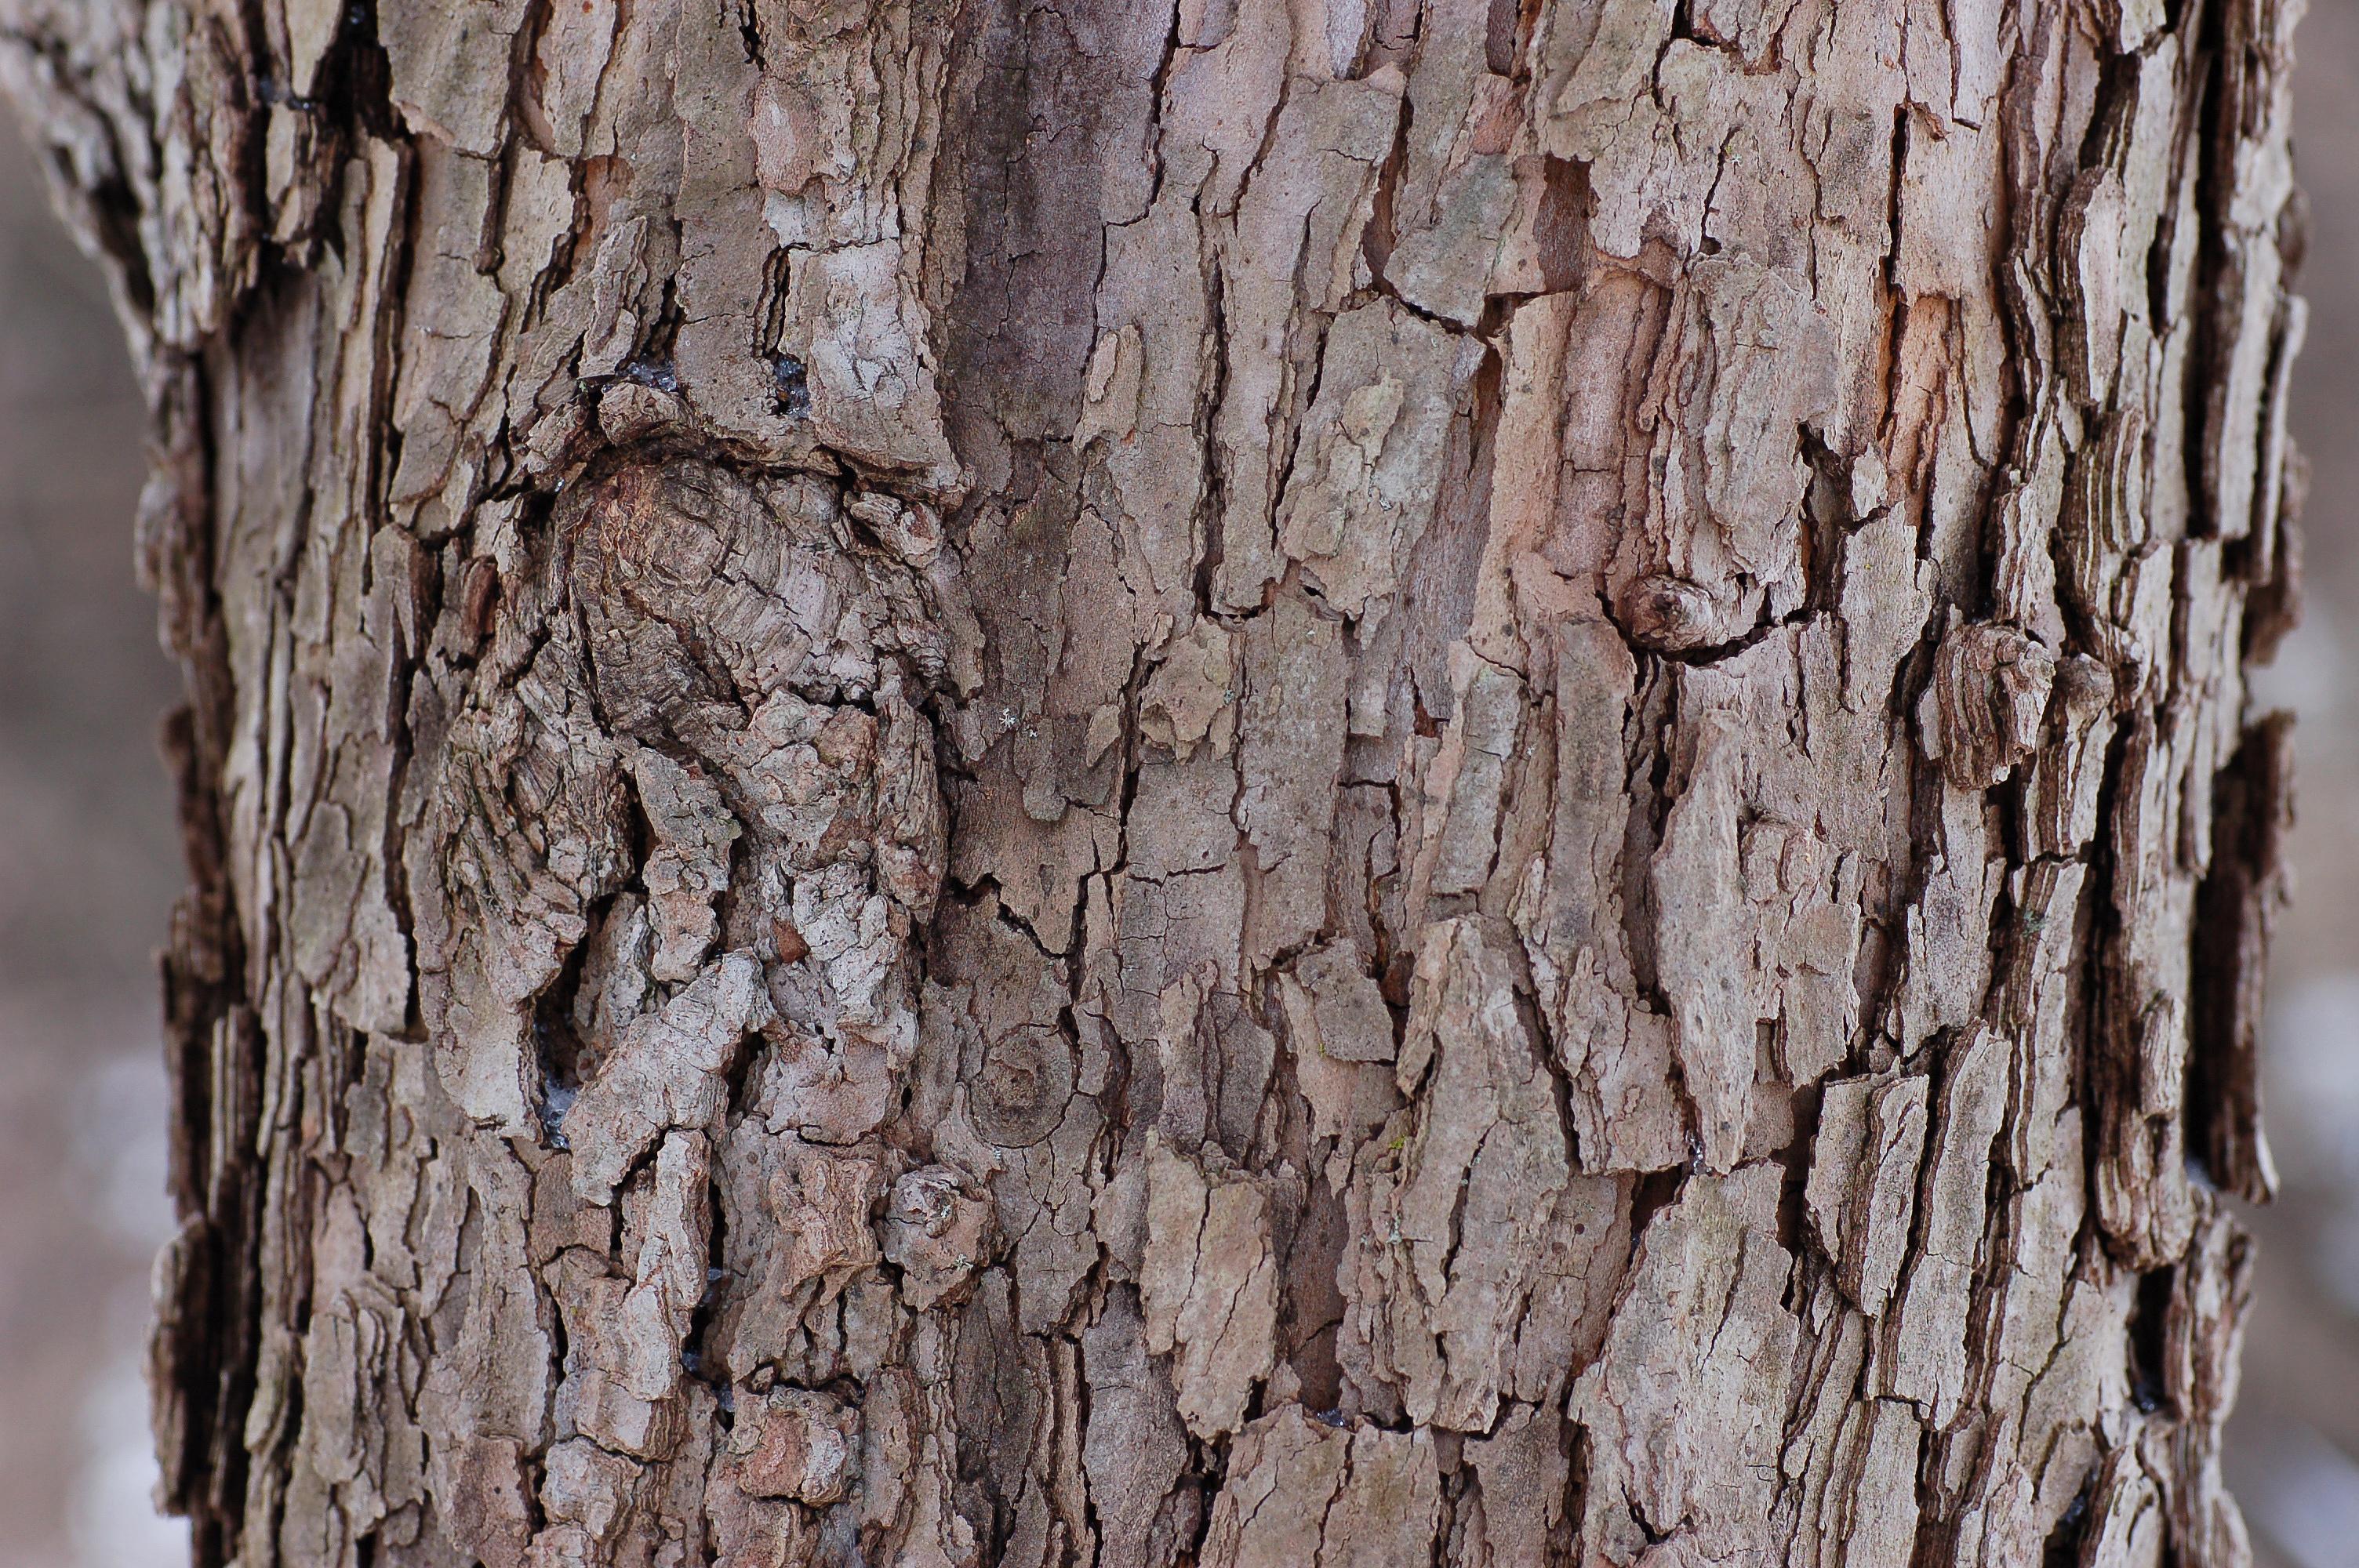 File:Flowering Dogwood Cornus florida 'First Lady' Bark Detail 3008px.jpg - Wikimedia Commons